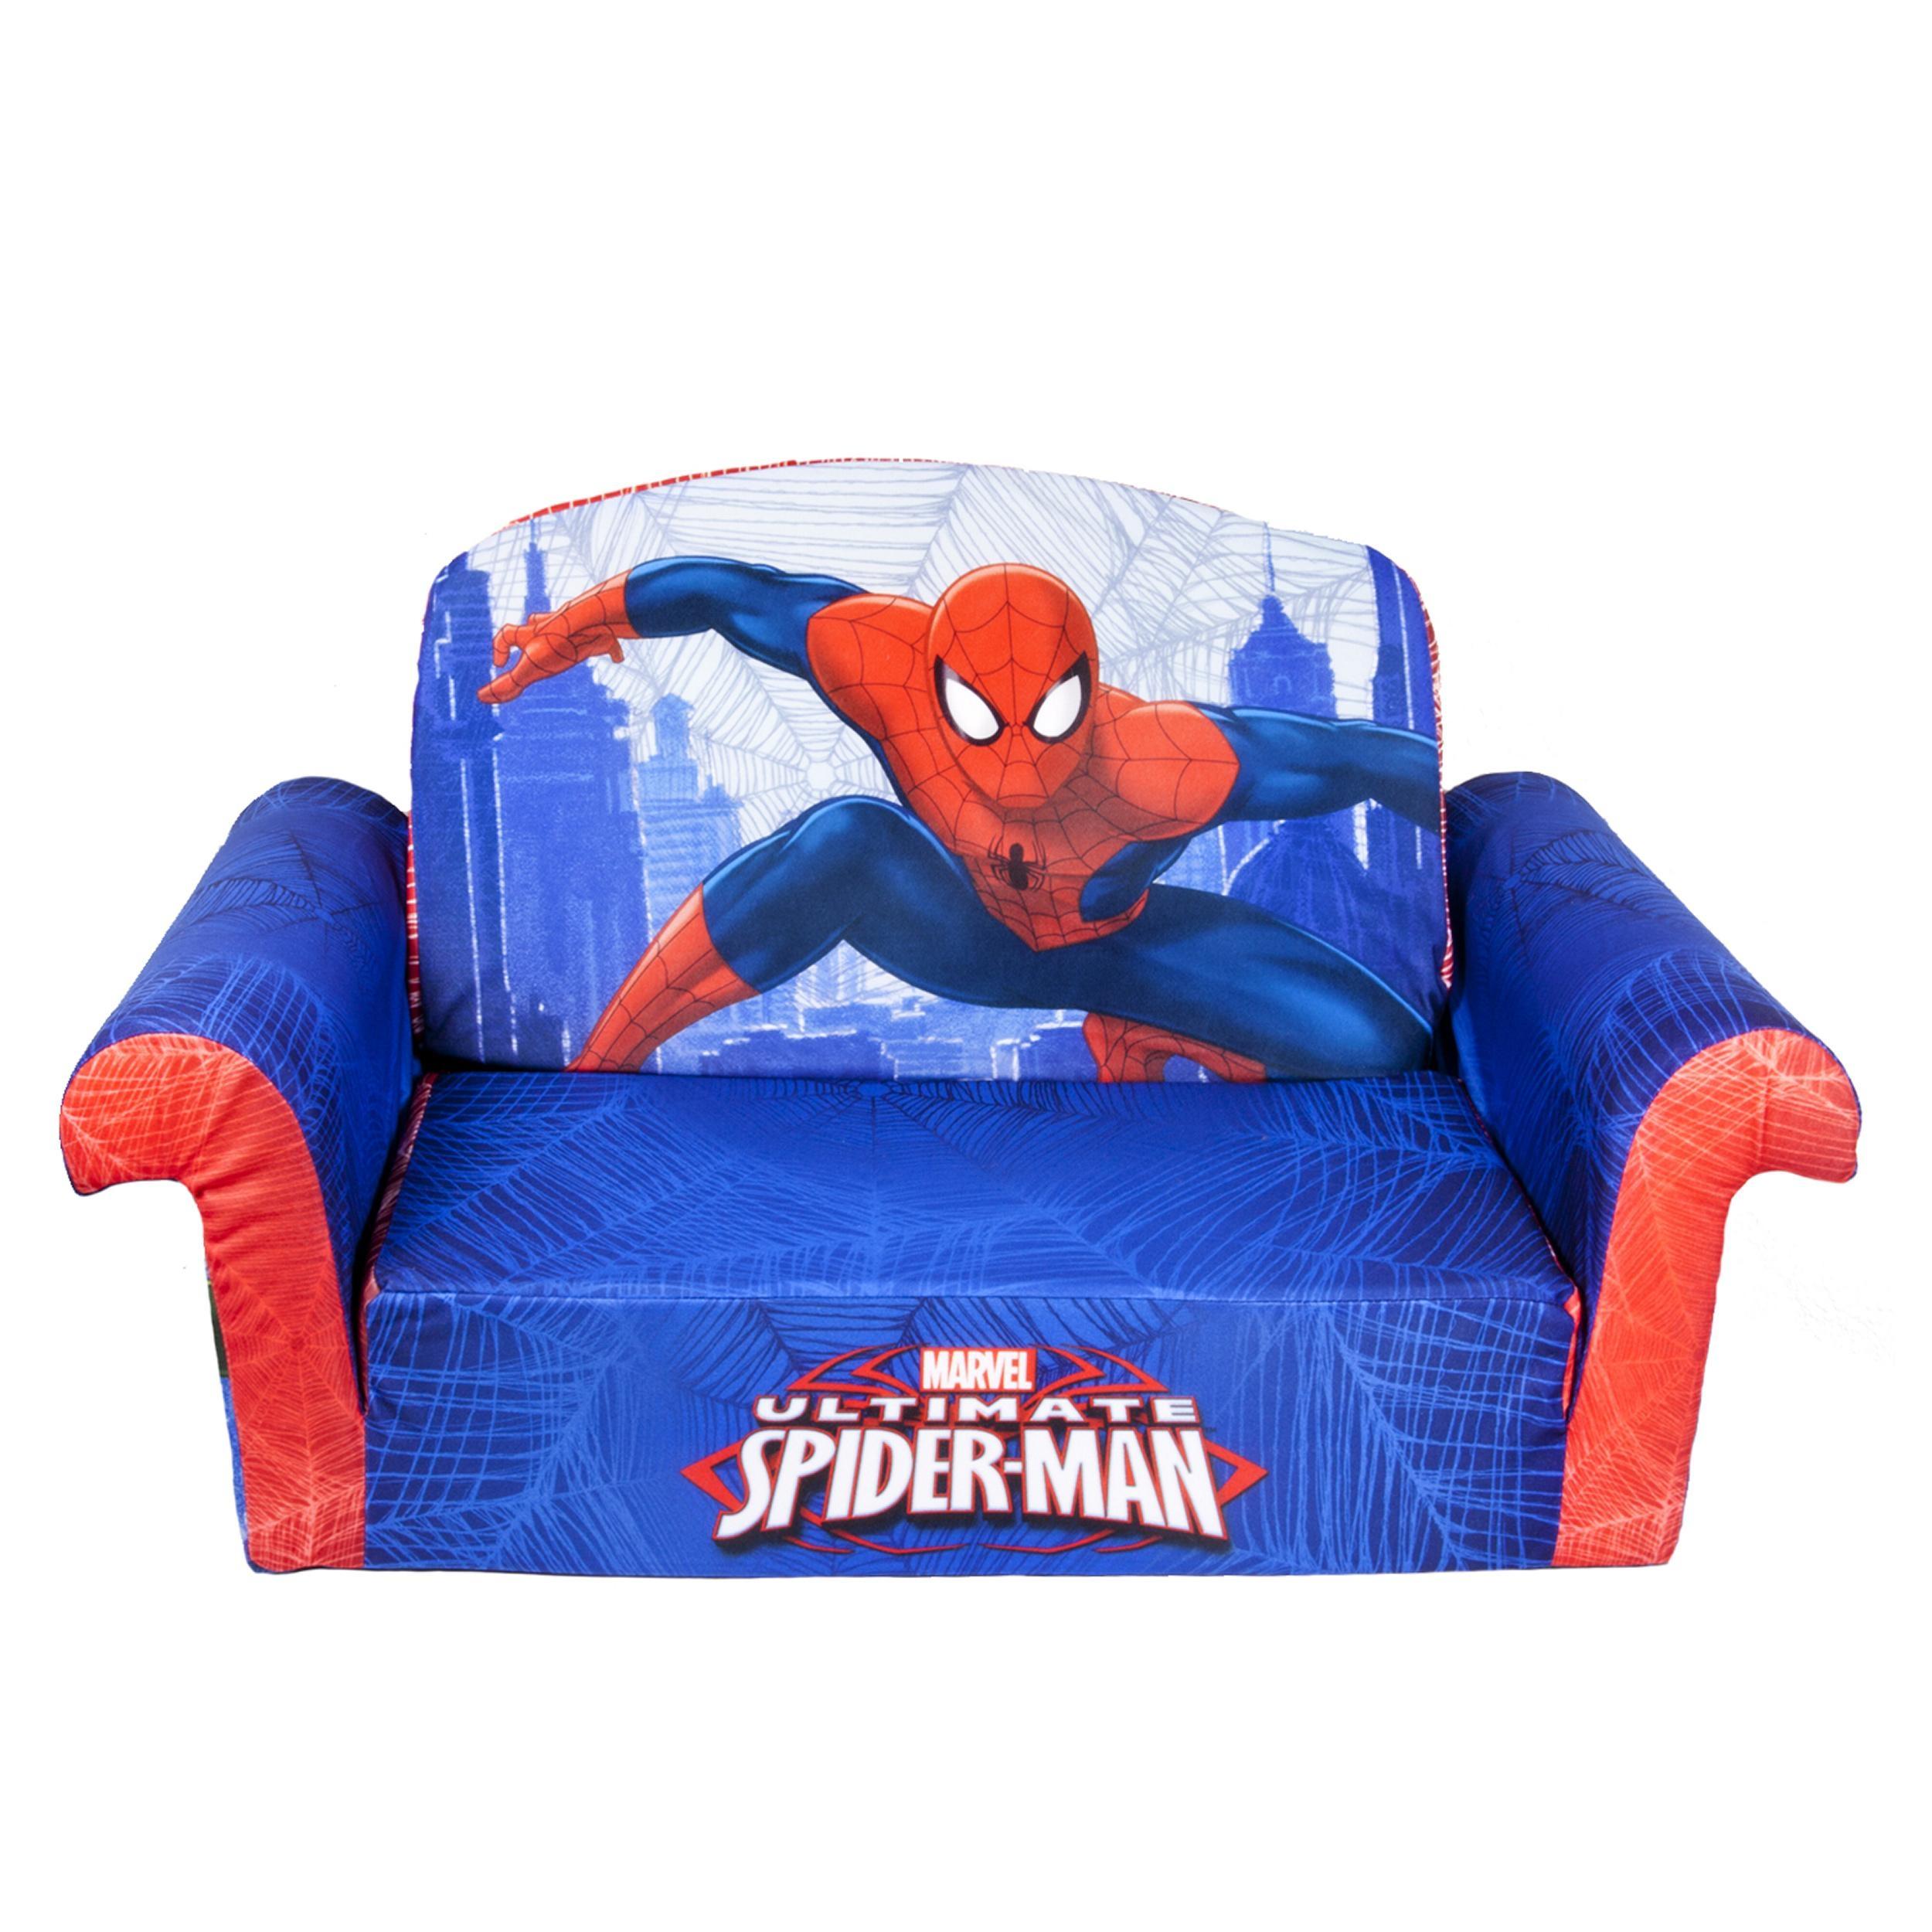 Kids Flip Open Sofa Intended For Kid Flip Open Sofa Beds (View 14 of 20)